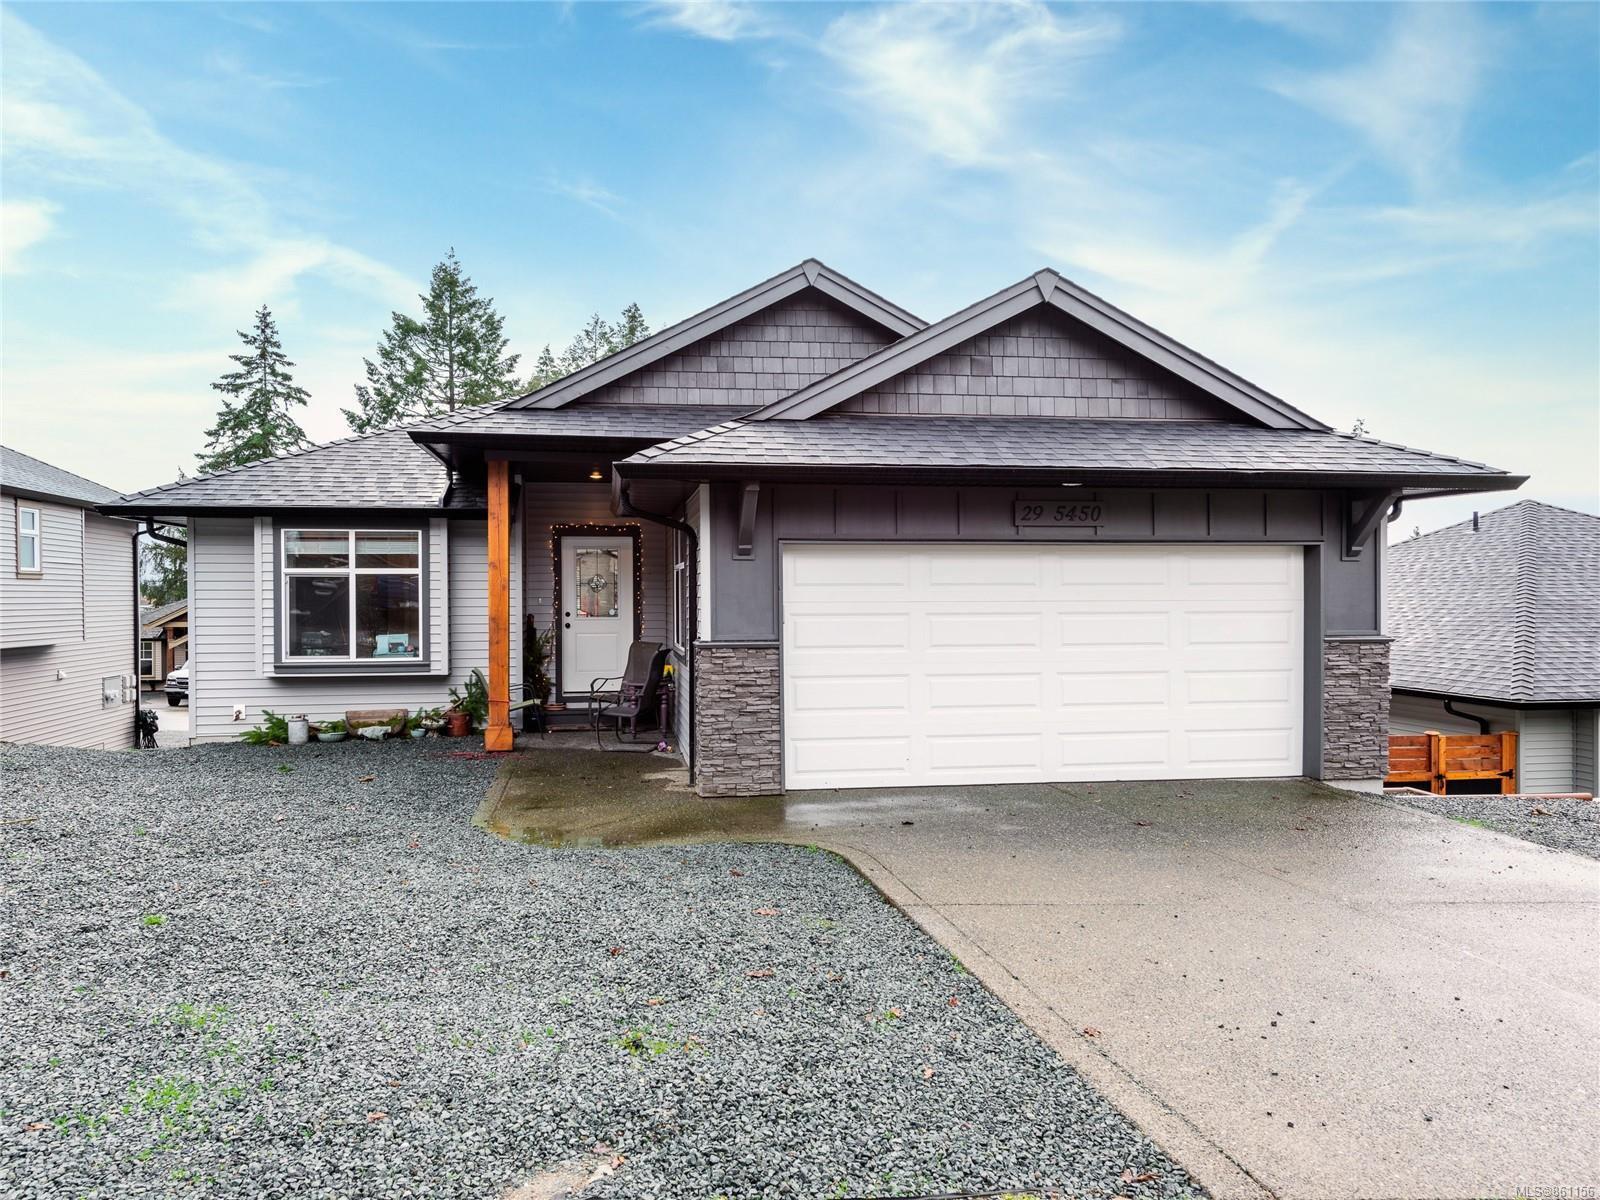 Main Photo: 29 5450 Tomswood Rd in : PA Port Alberni House for sale (Port Alberni)  : MLS®# 861156